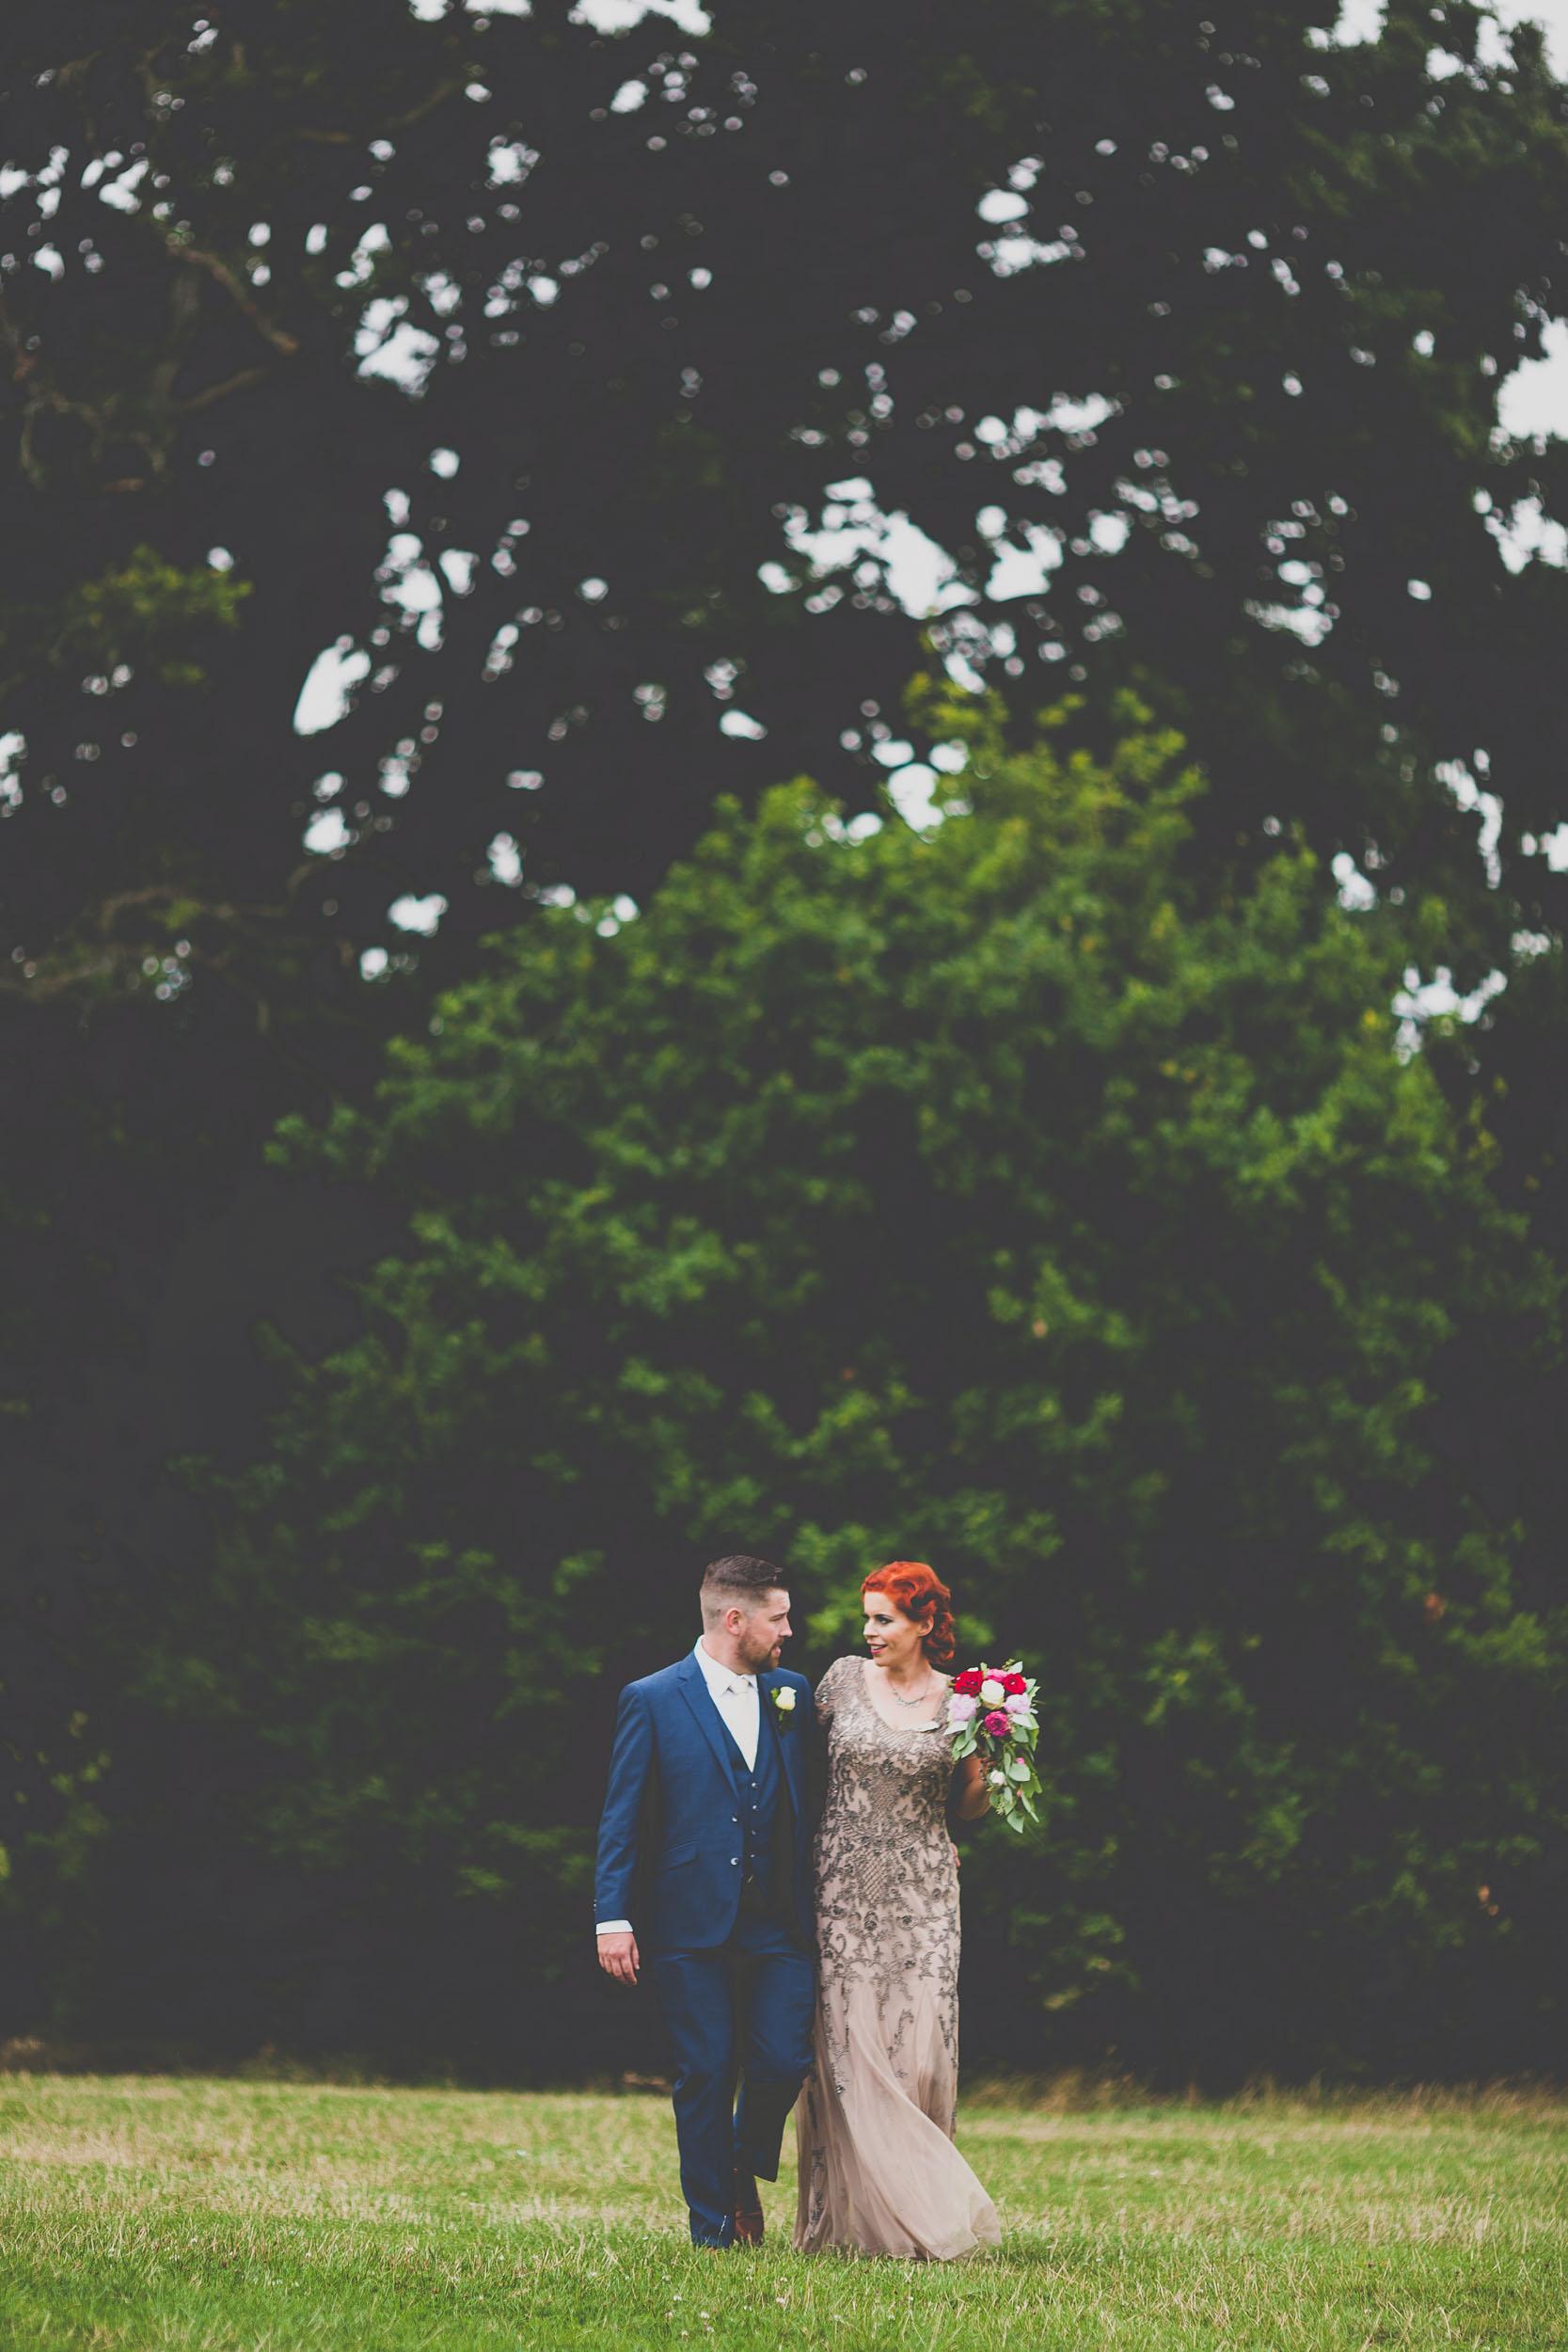 queen-elizabeths-hunting-lodge-epping-forest-wedding198.jpg